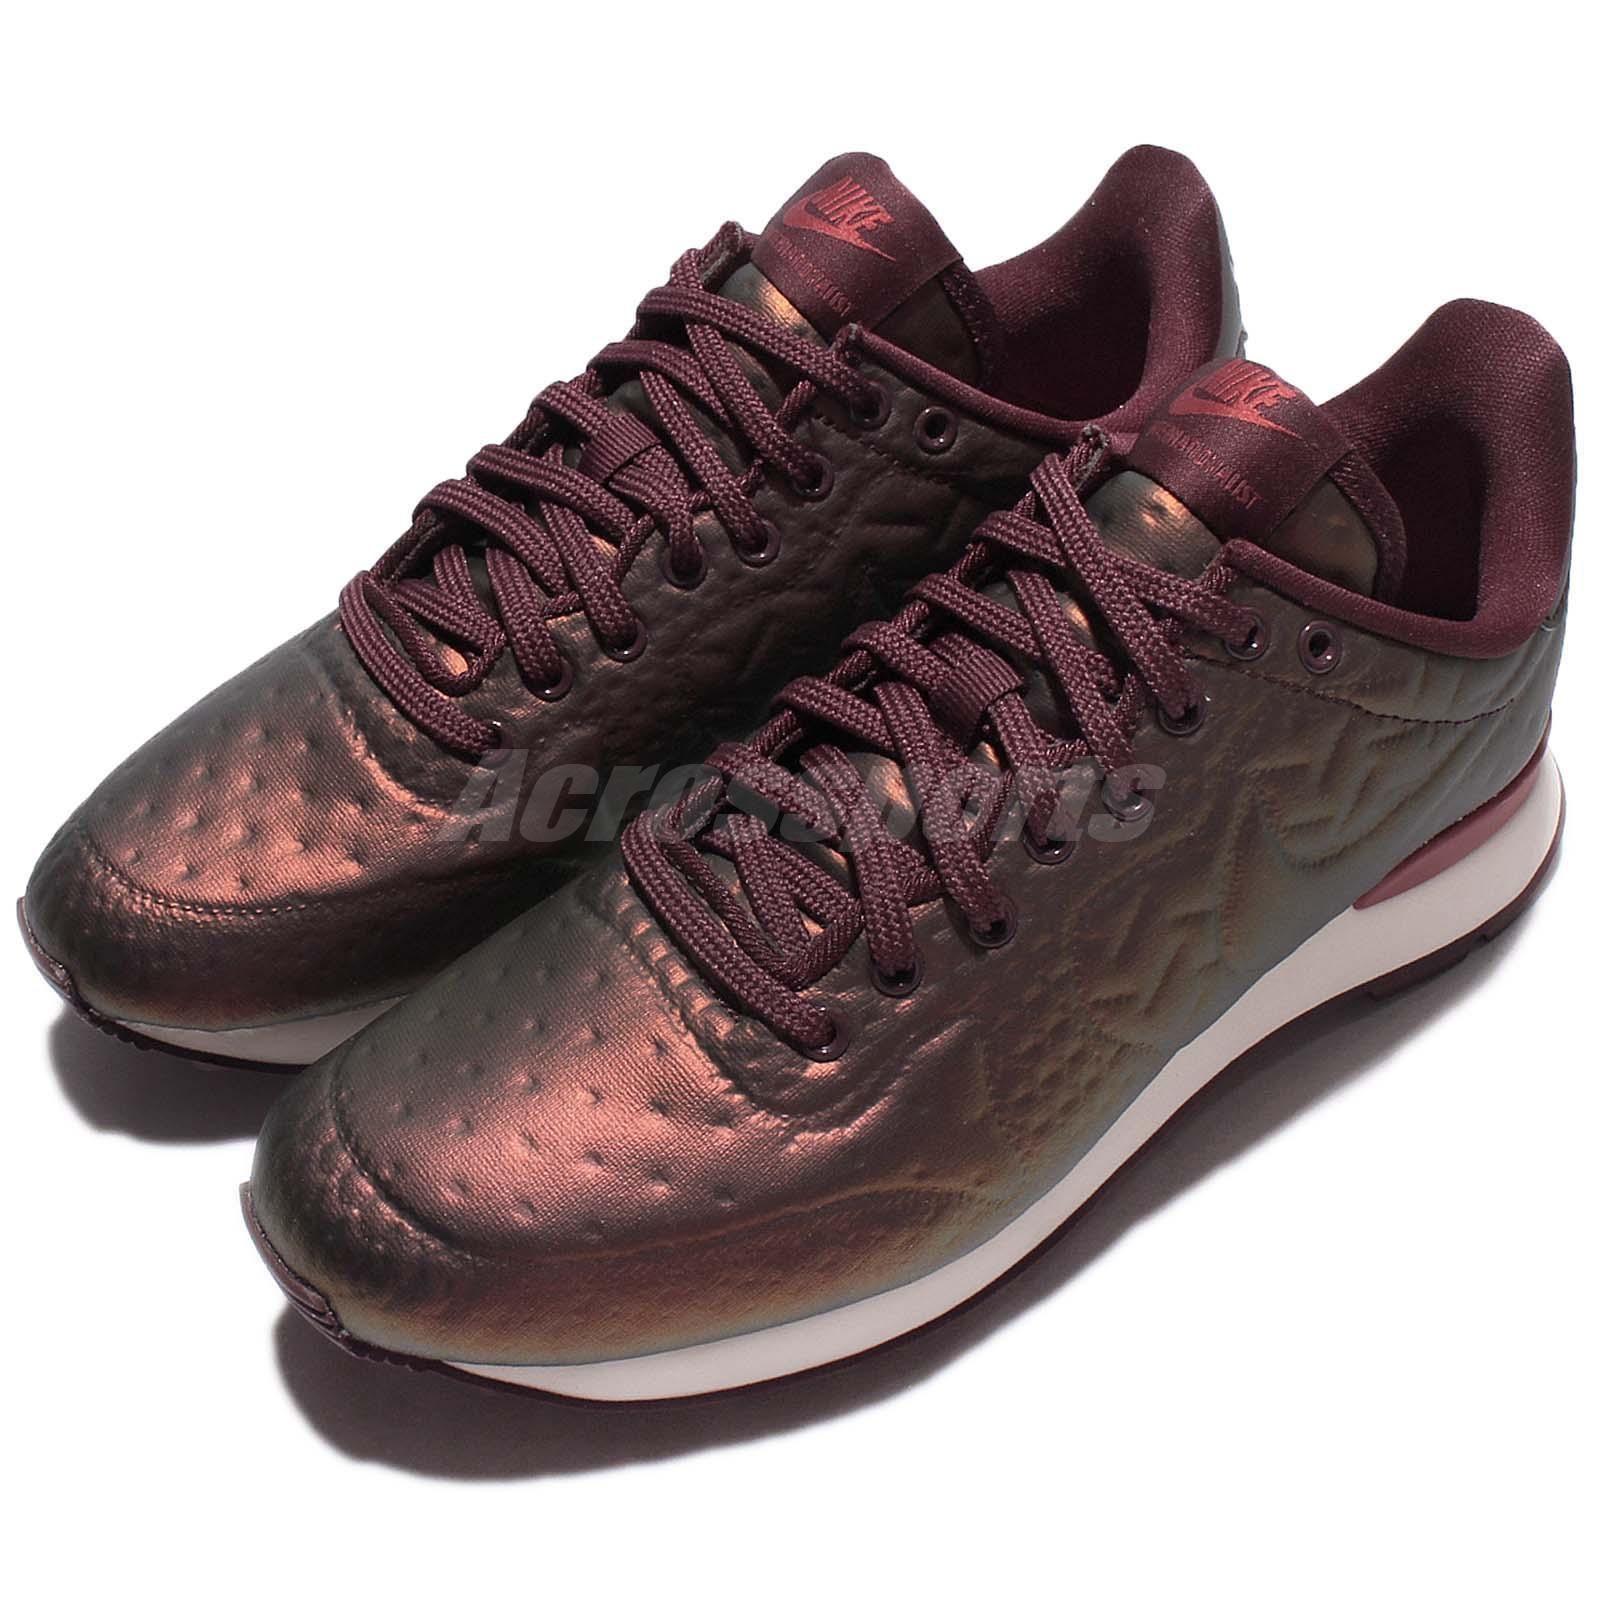 89f2a3819243 Wmns Nike Internationalist Jcrd Wntr Winter Metallic Mahogany Womens  859544-900